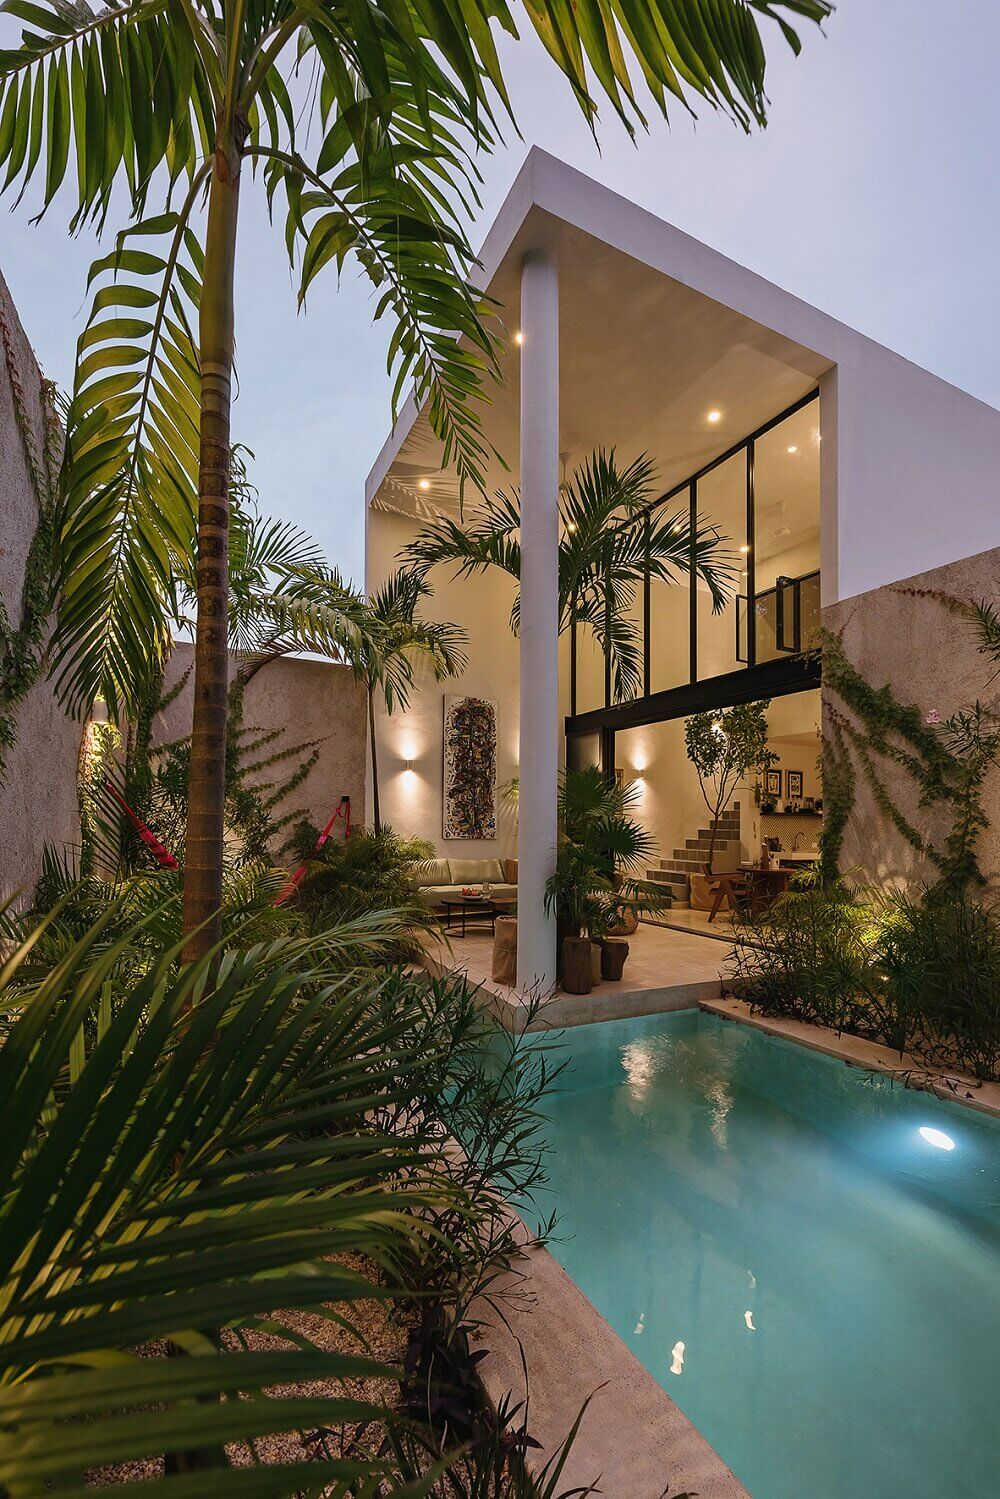 Casa Hannah | An Architectural Indoor/Outdoor Villa in Mexico